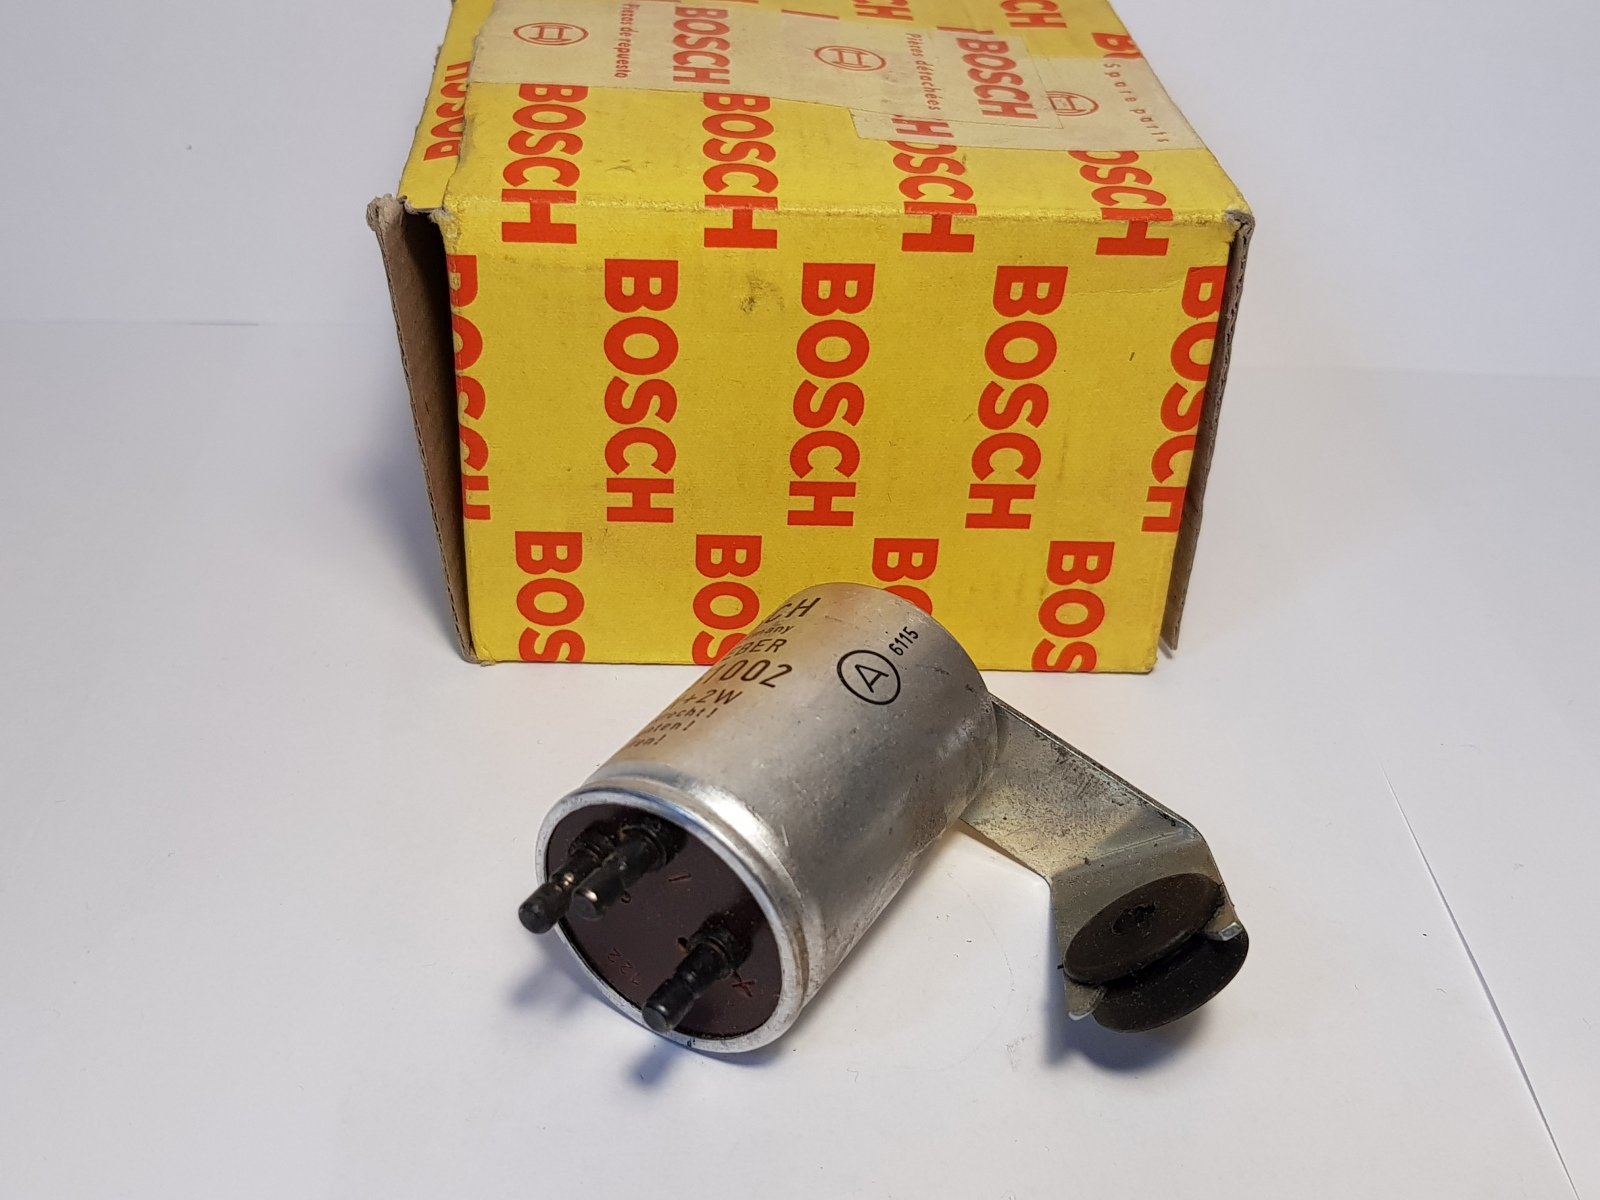 Bosch 0336251002 Blinkgeber Blinkergeber 6V 2x18W Elektrisch Indicator Unit